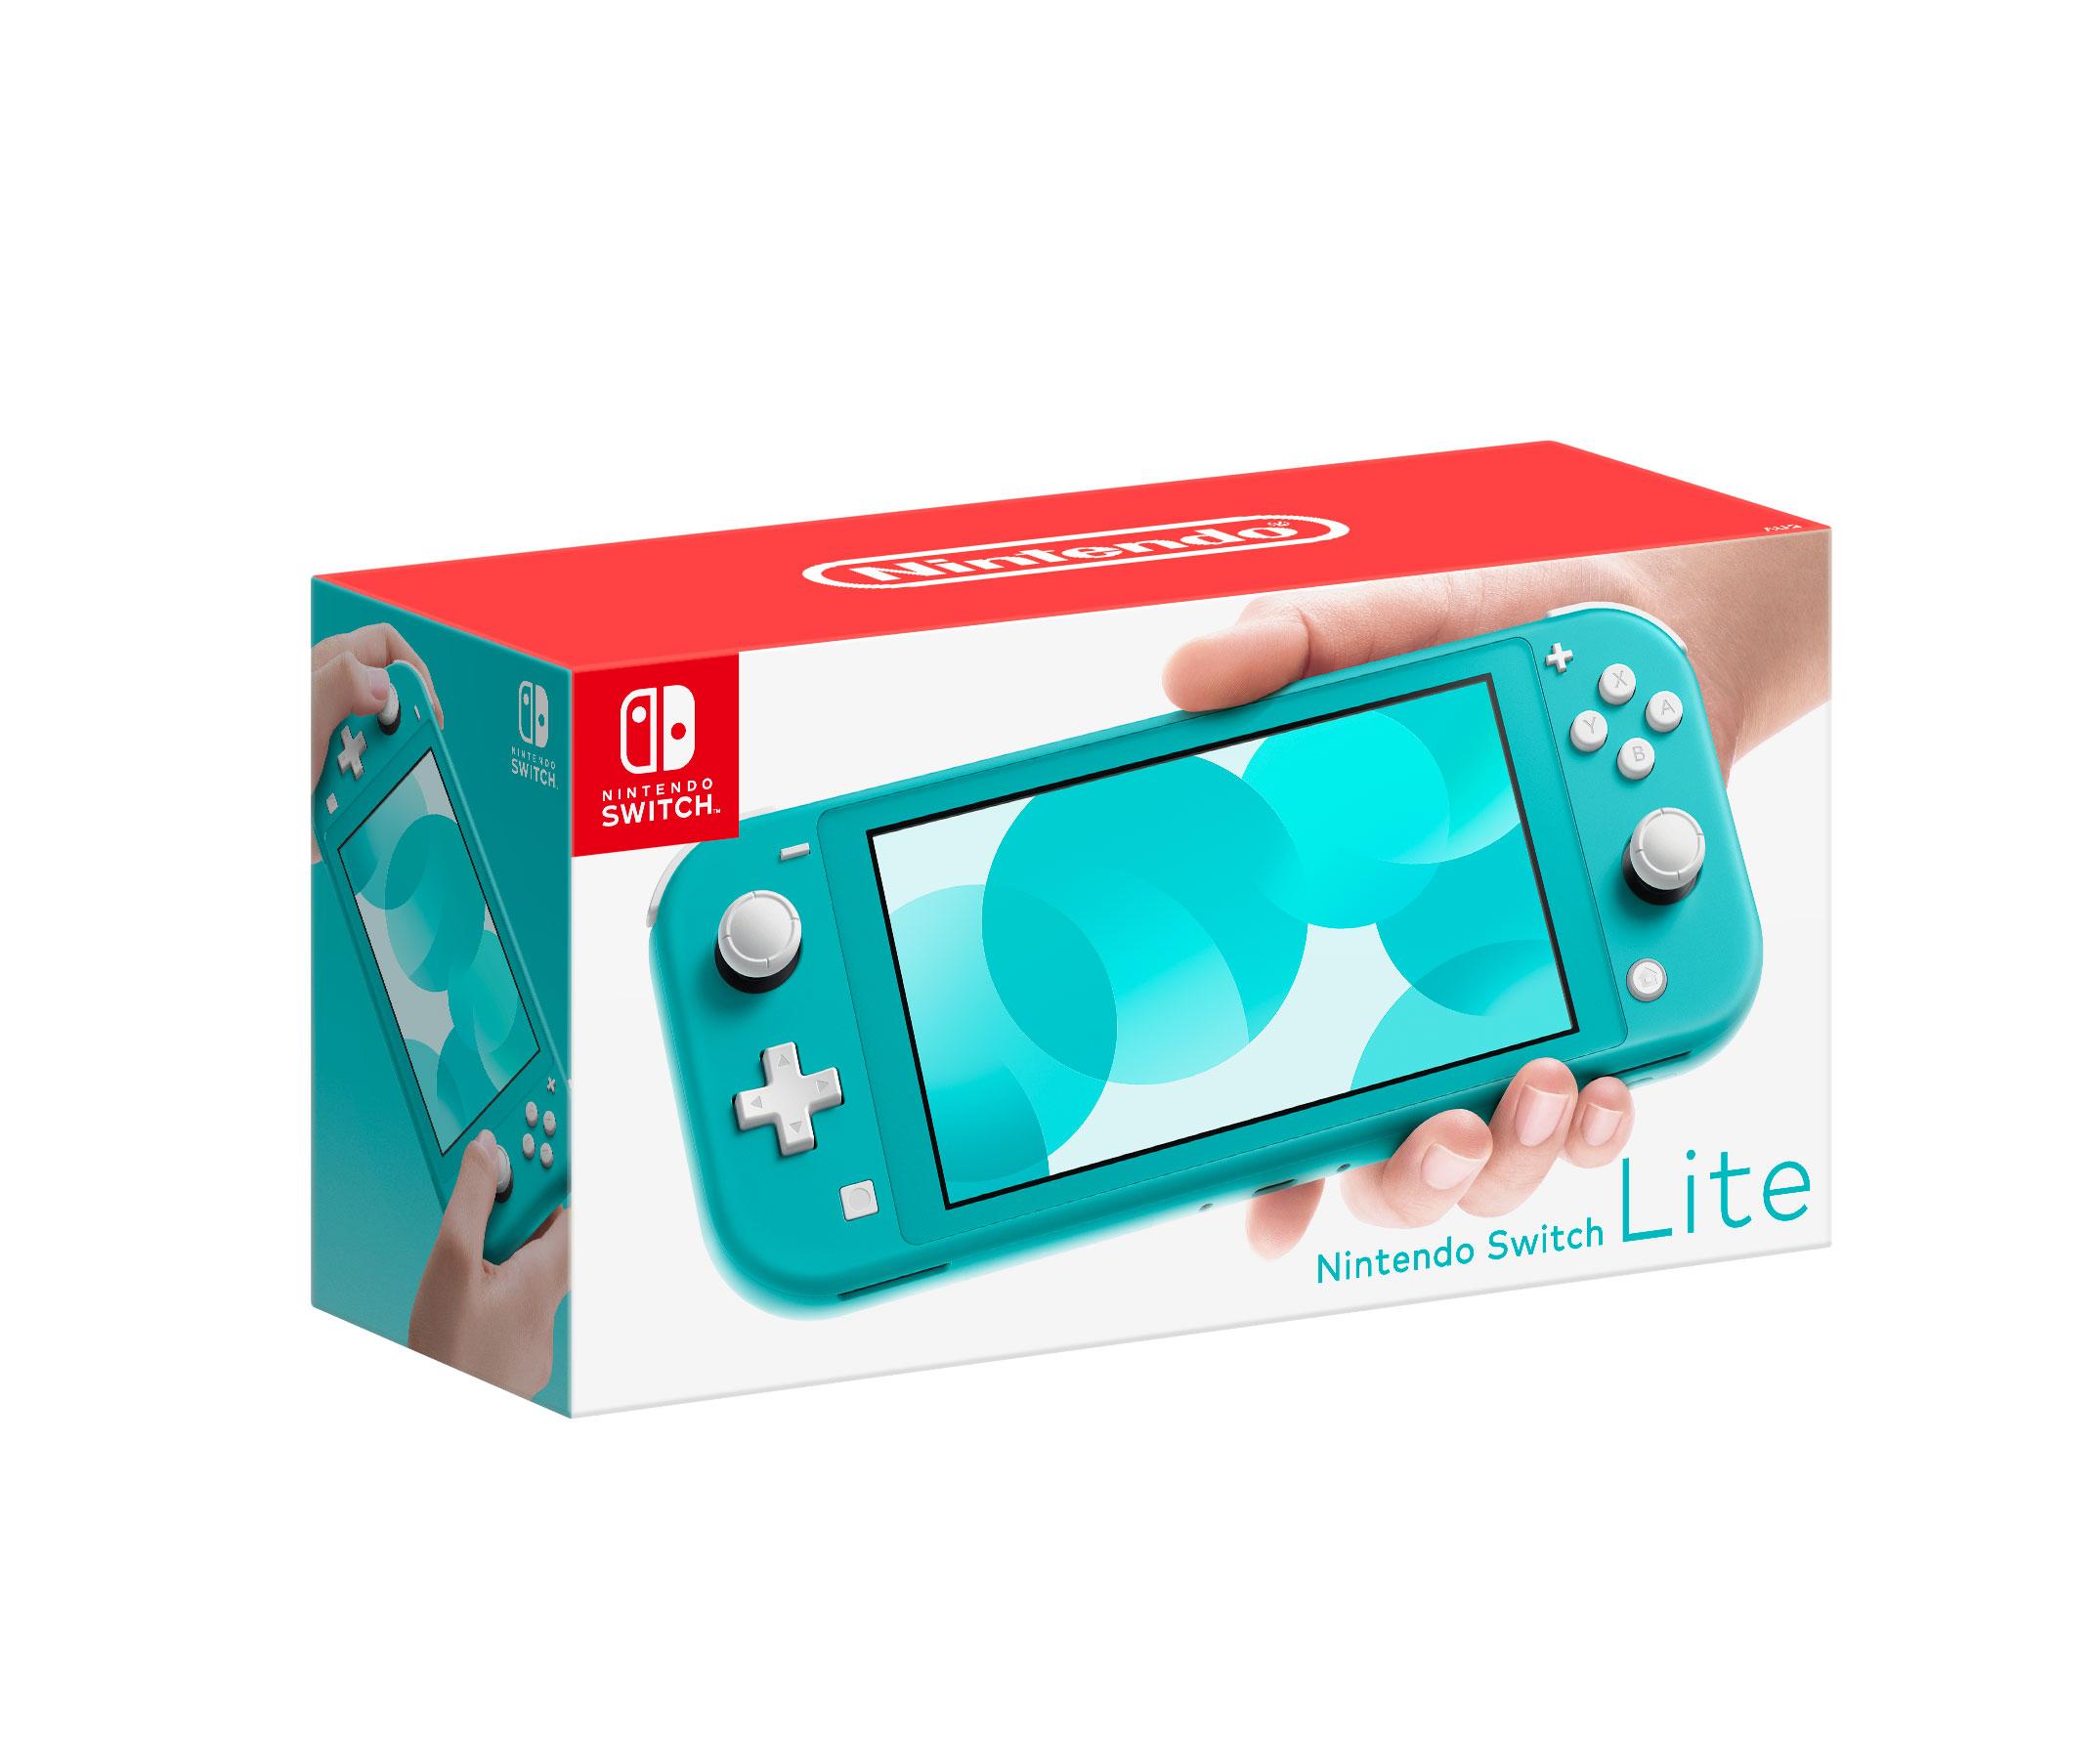 Nintendo Switch Lite - Turquoise Packshot.jpg